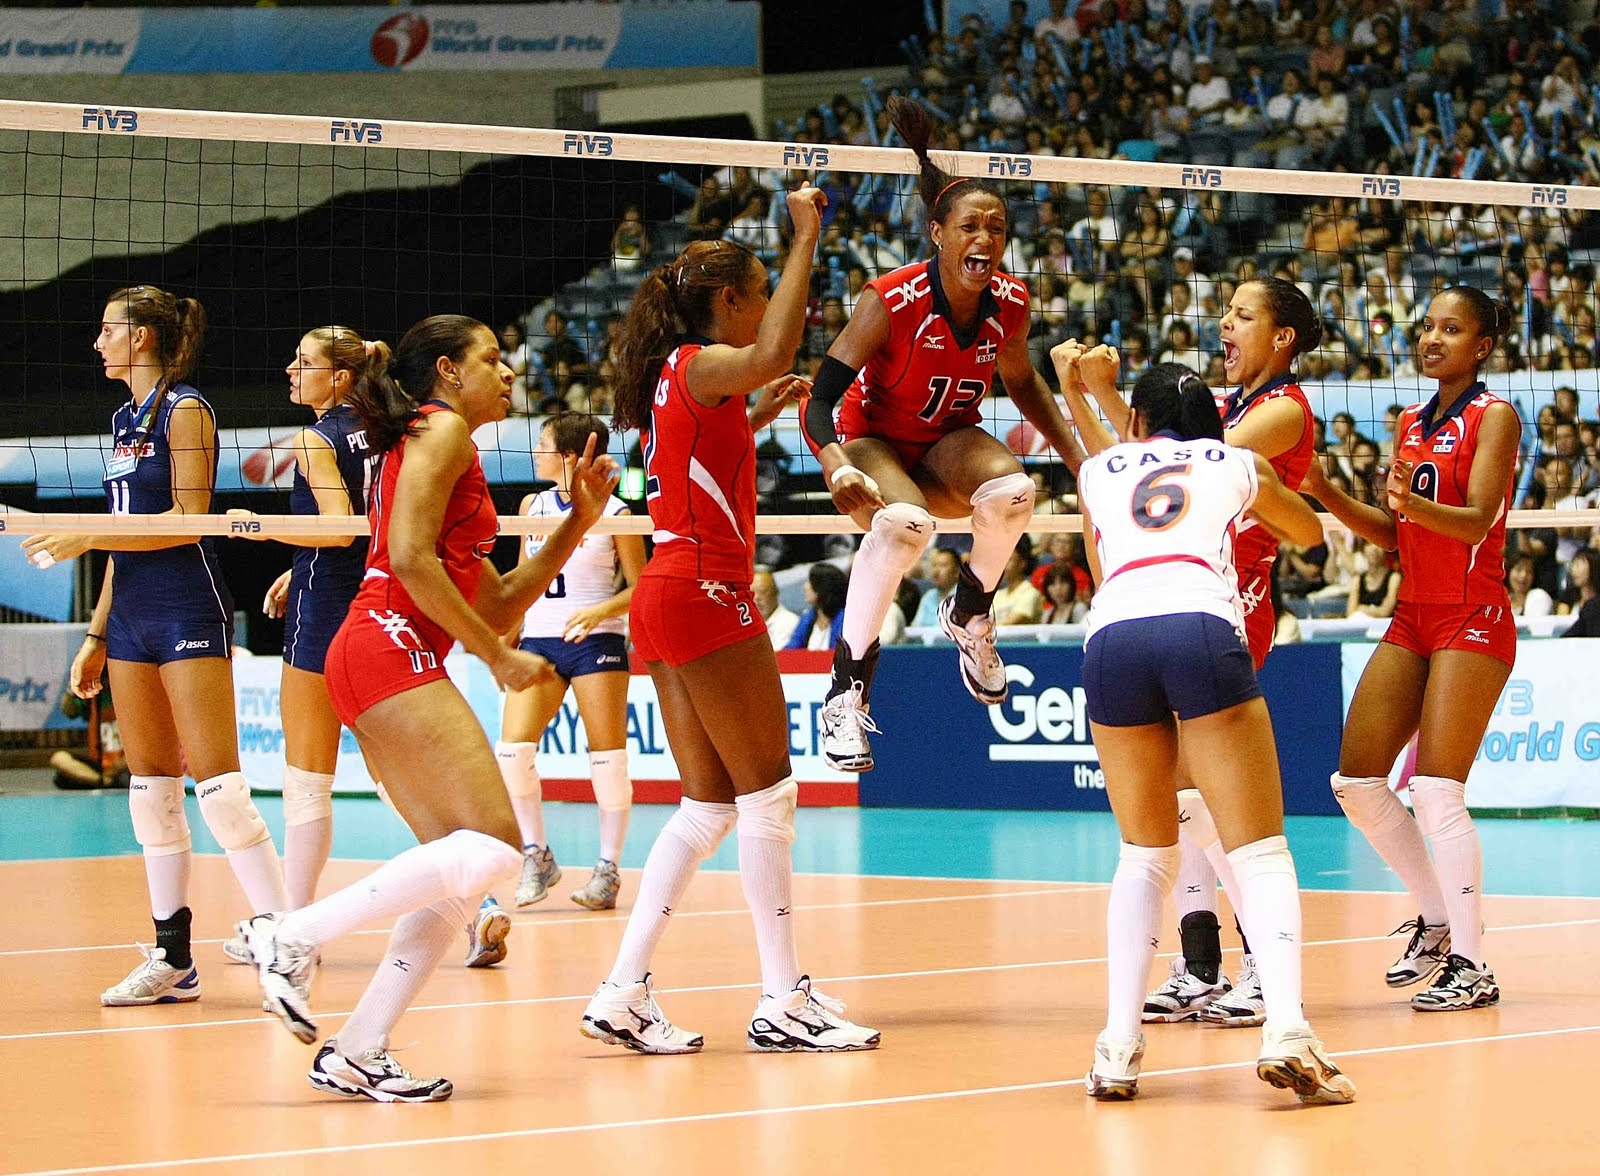 mundiales voleibol: